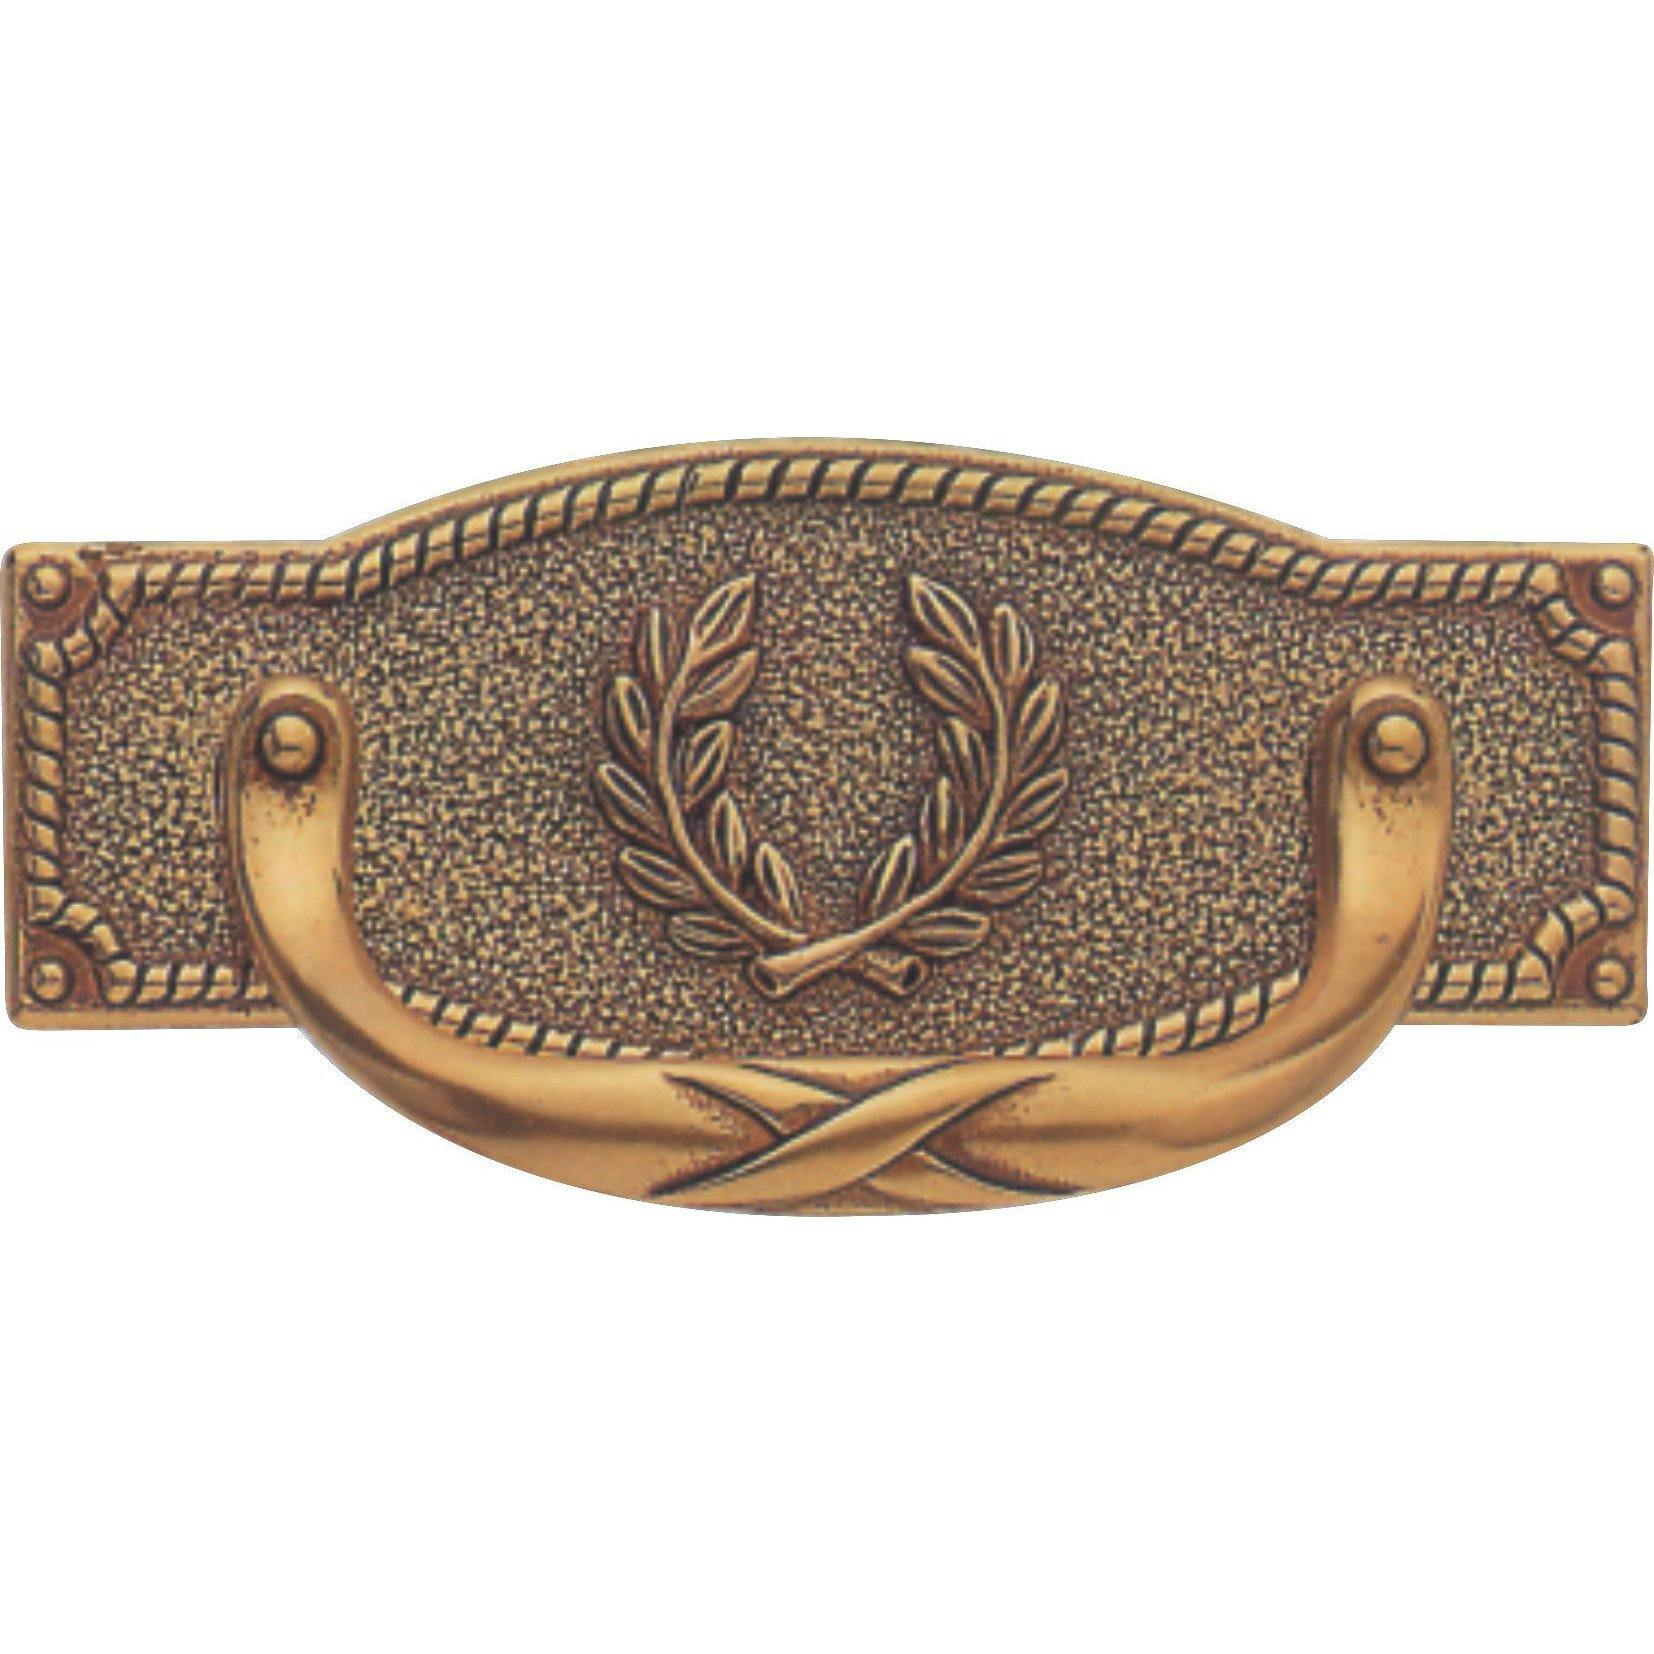 Antique drawer handle